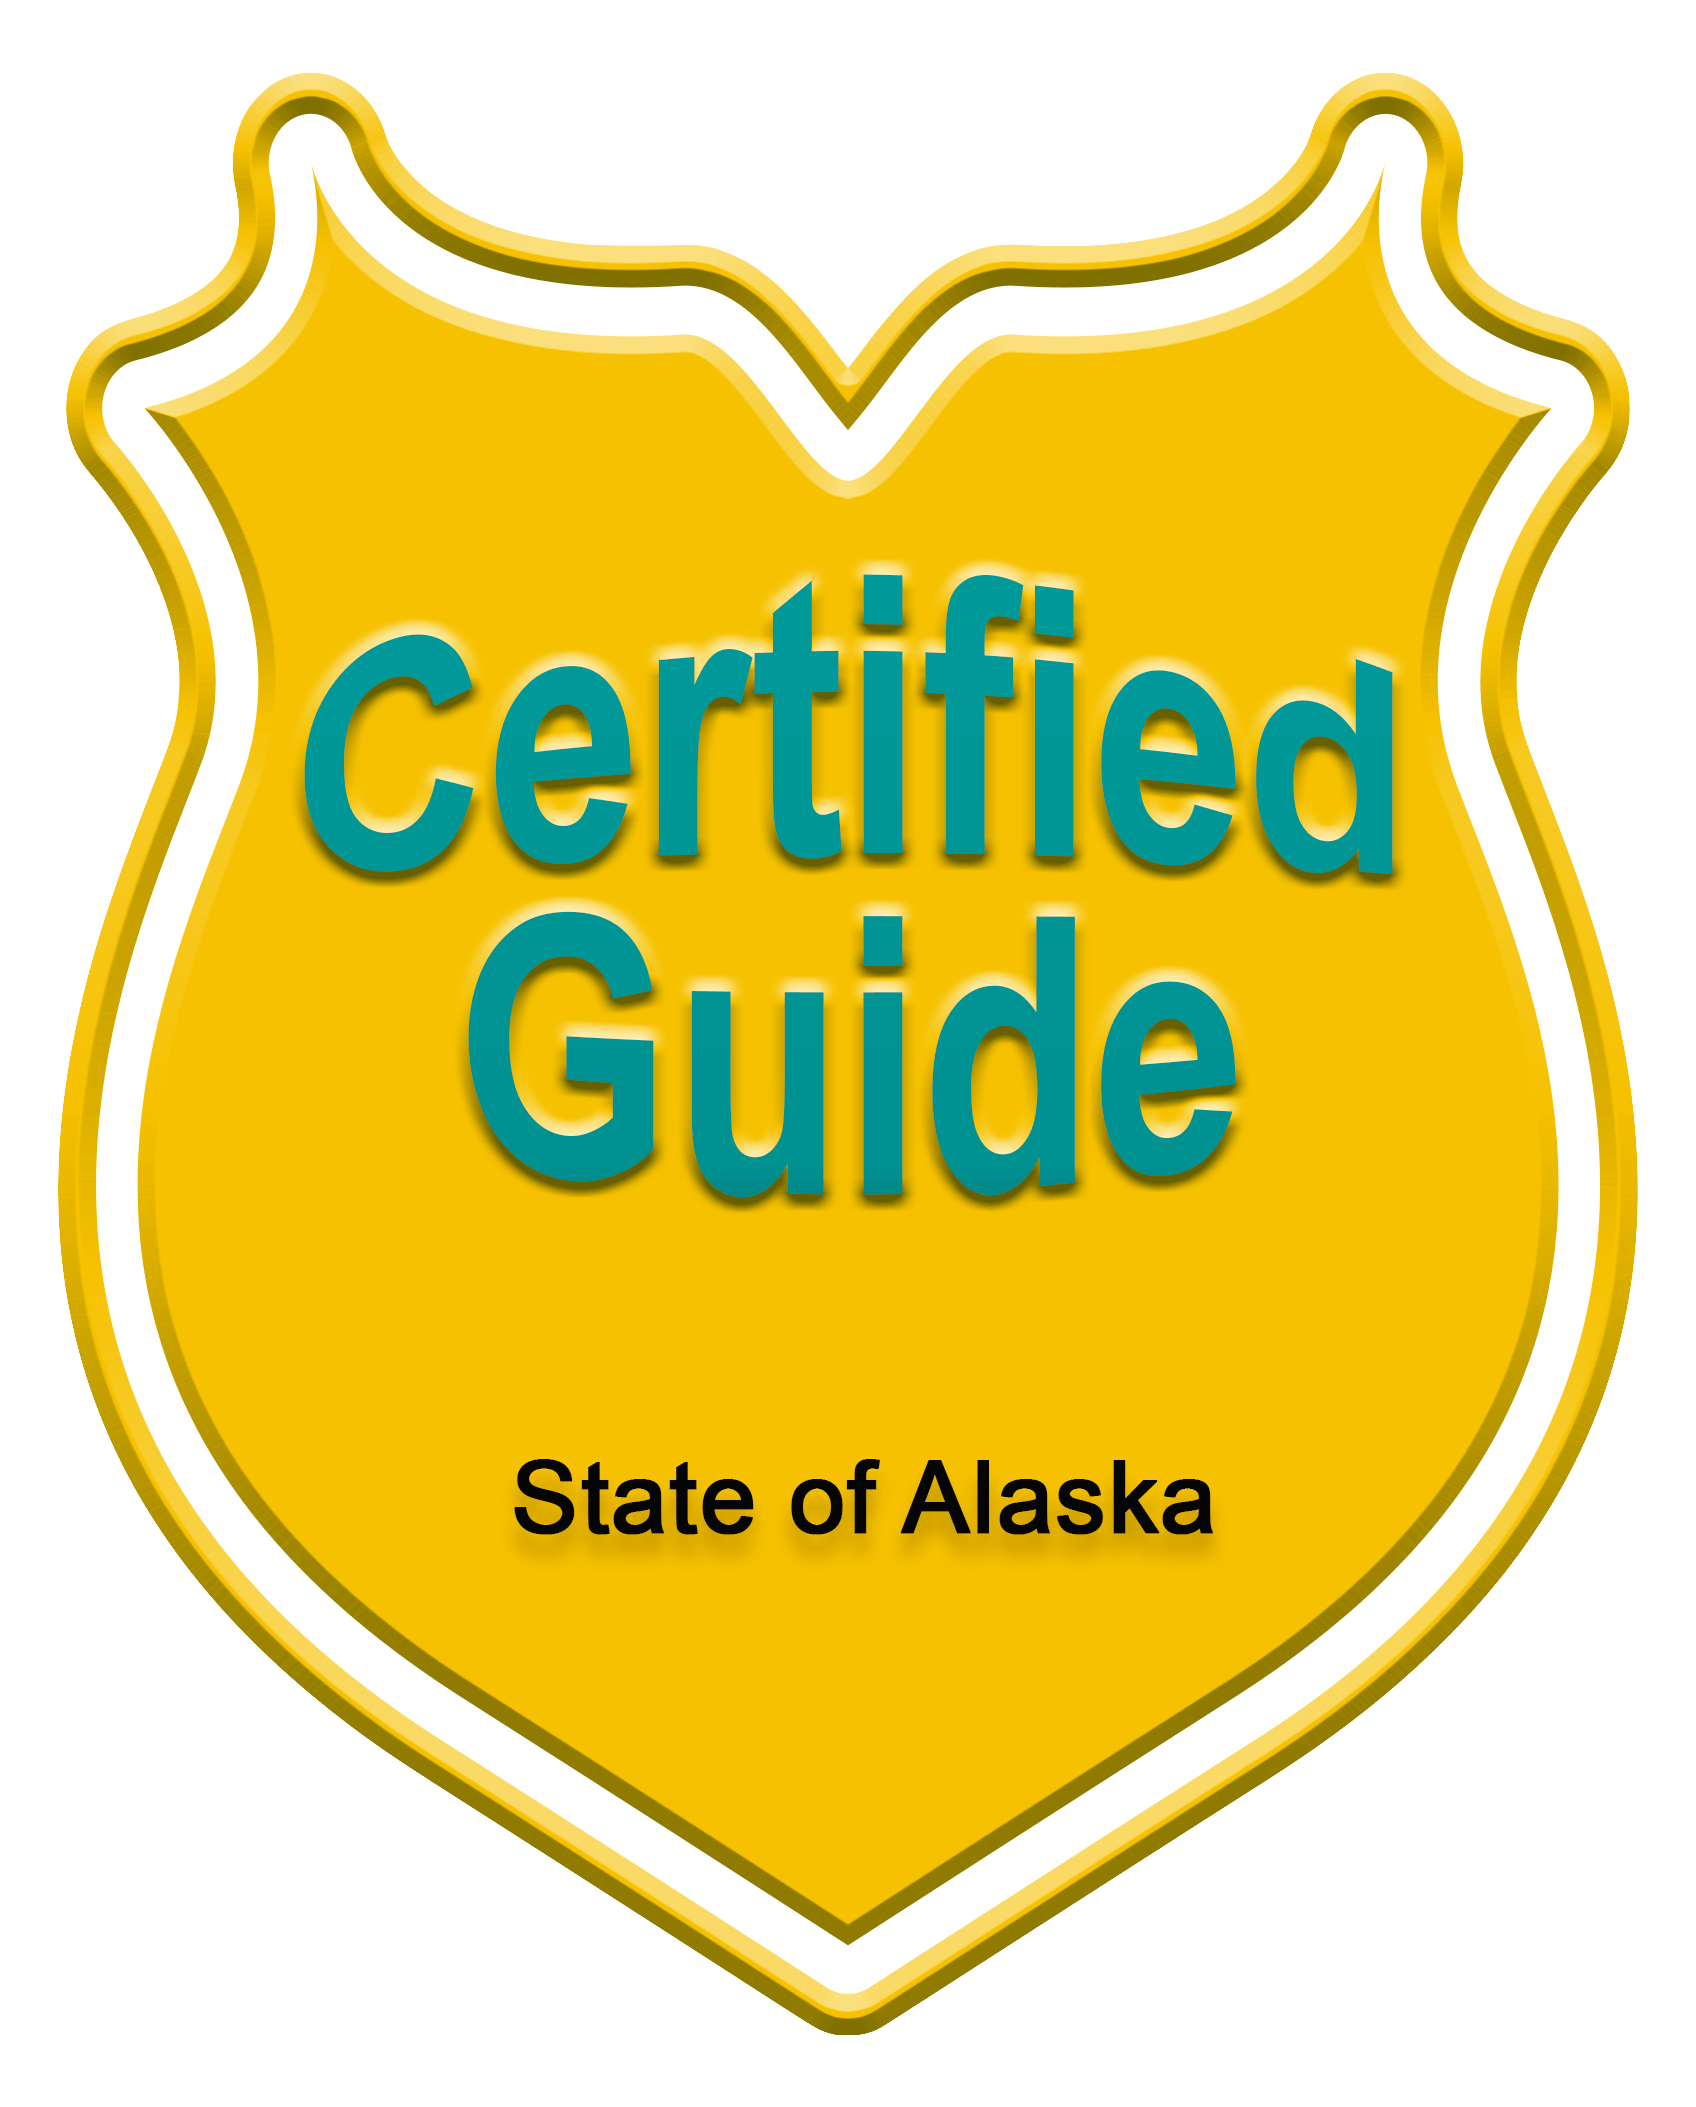 https://alaskaupclose.com/wp-content/uploads/2015/12/certified-guide2.png